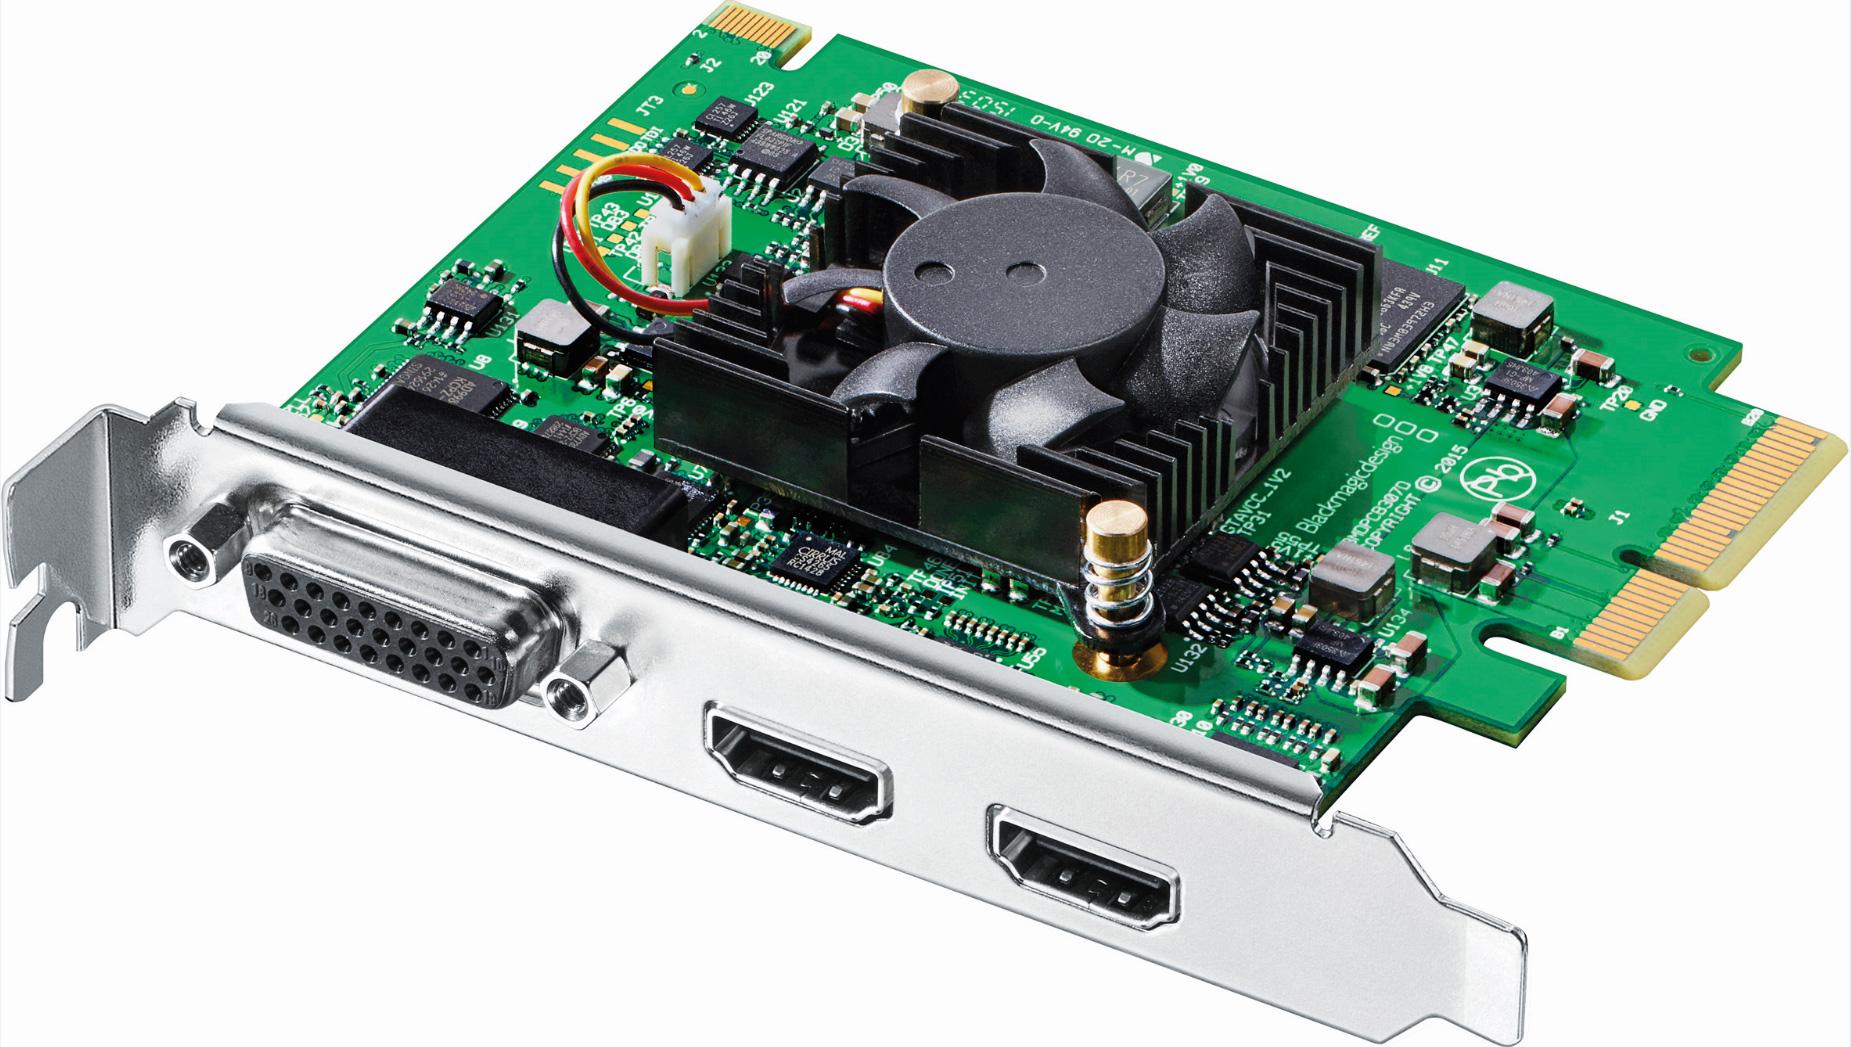 Blackmagic BMD-BINTSPRO4K Intensity Pro 4K Capture Card